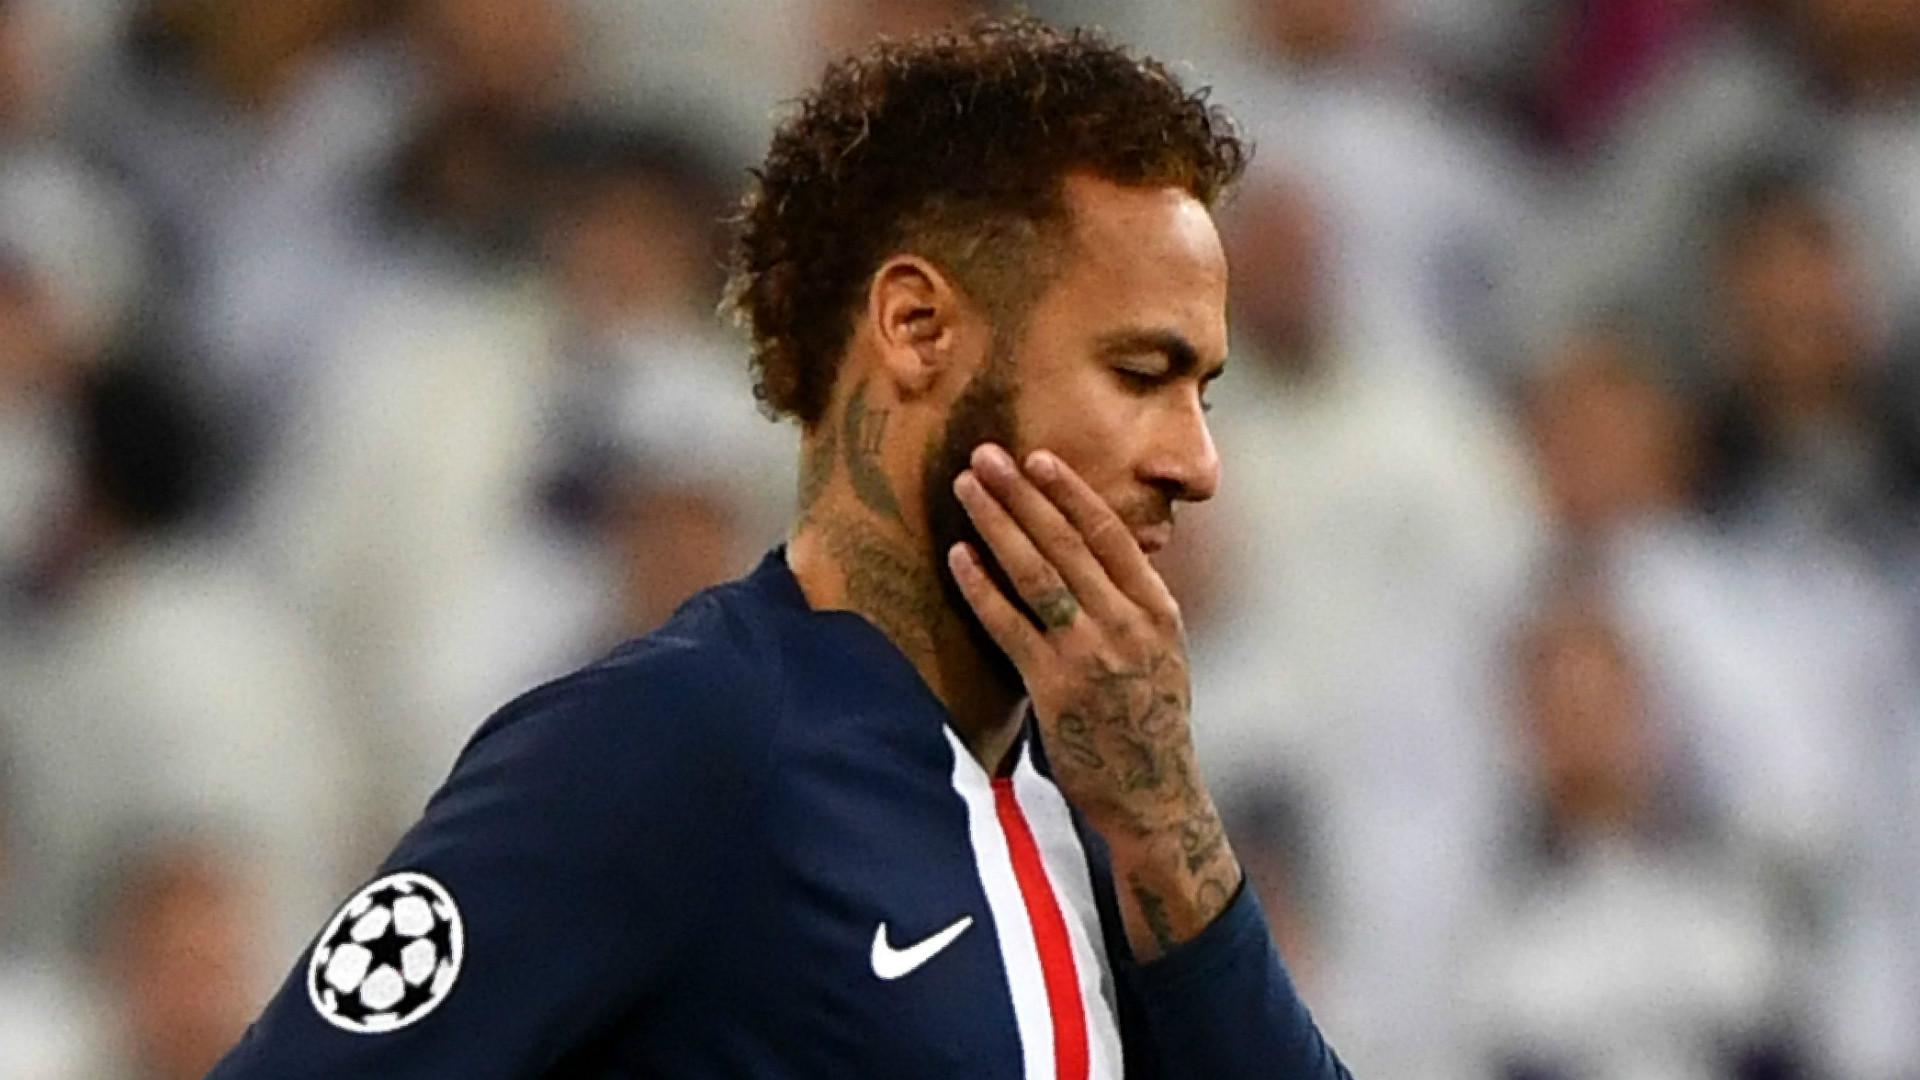 'Neymar sh*ts on PSG and their fans' - Brazilian slammed by Petit